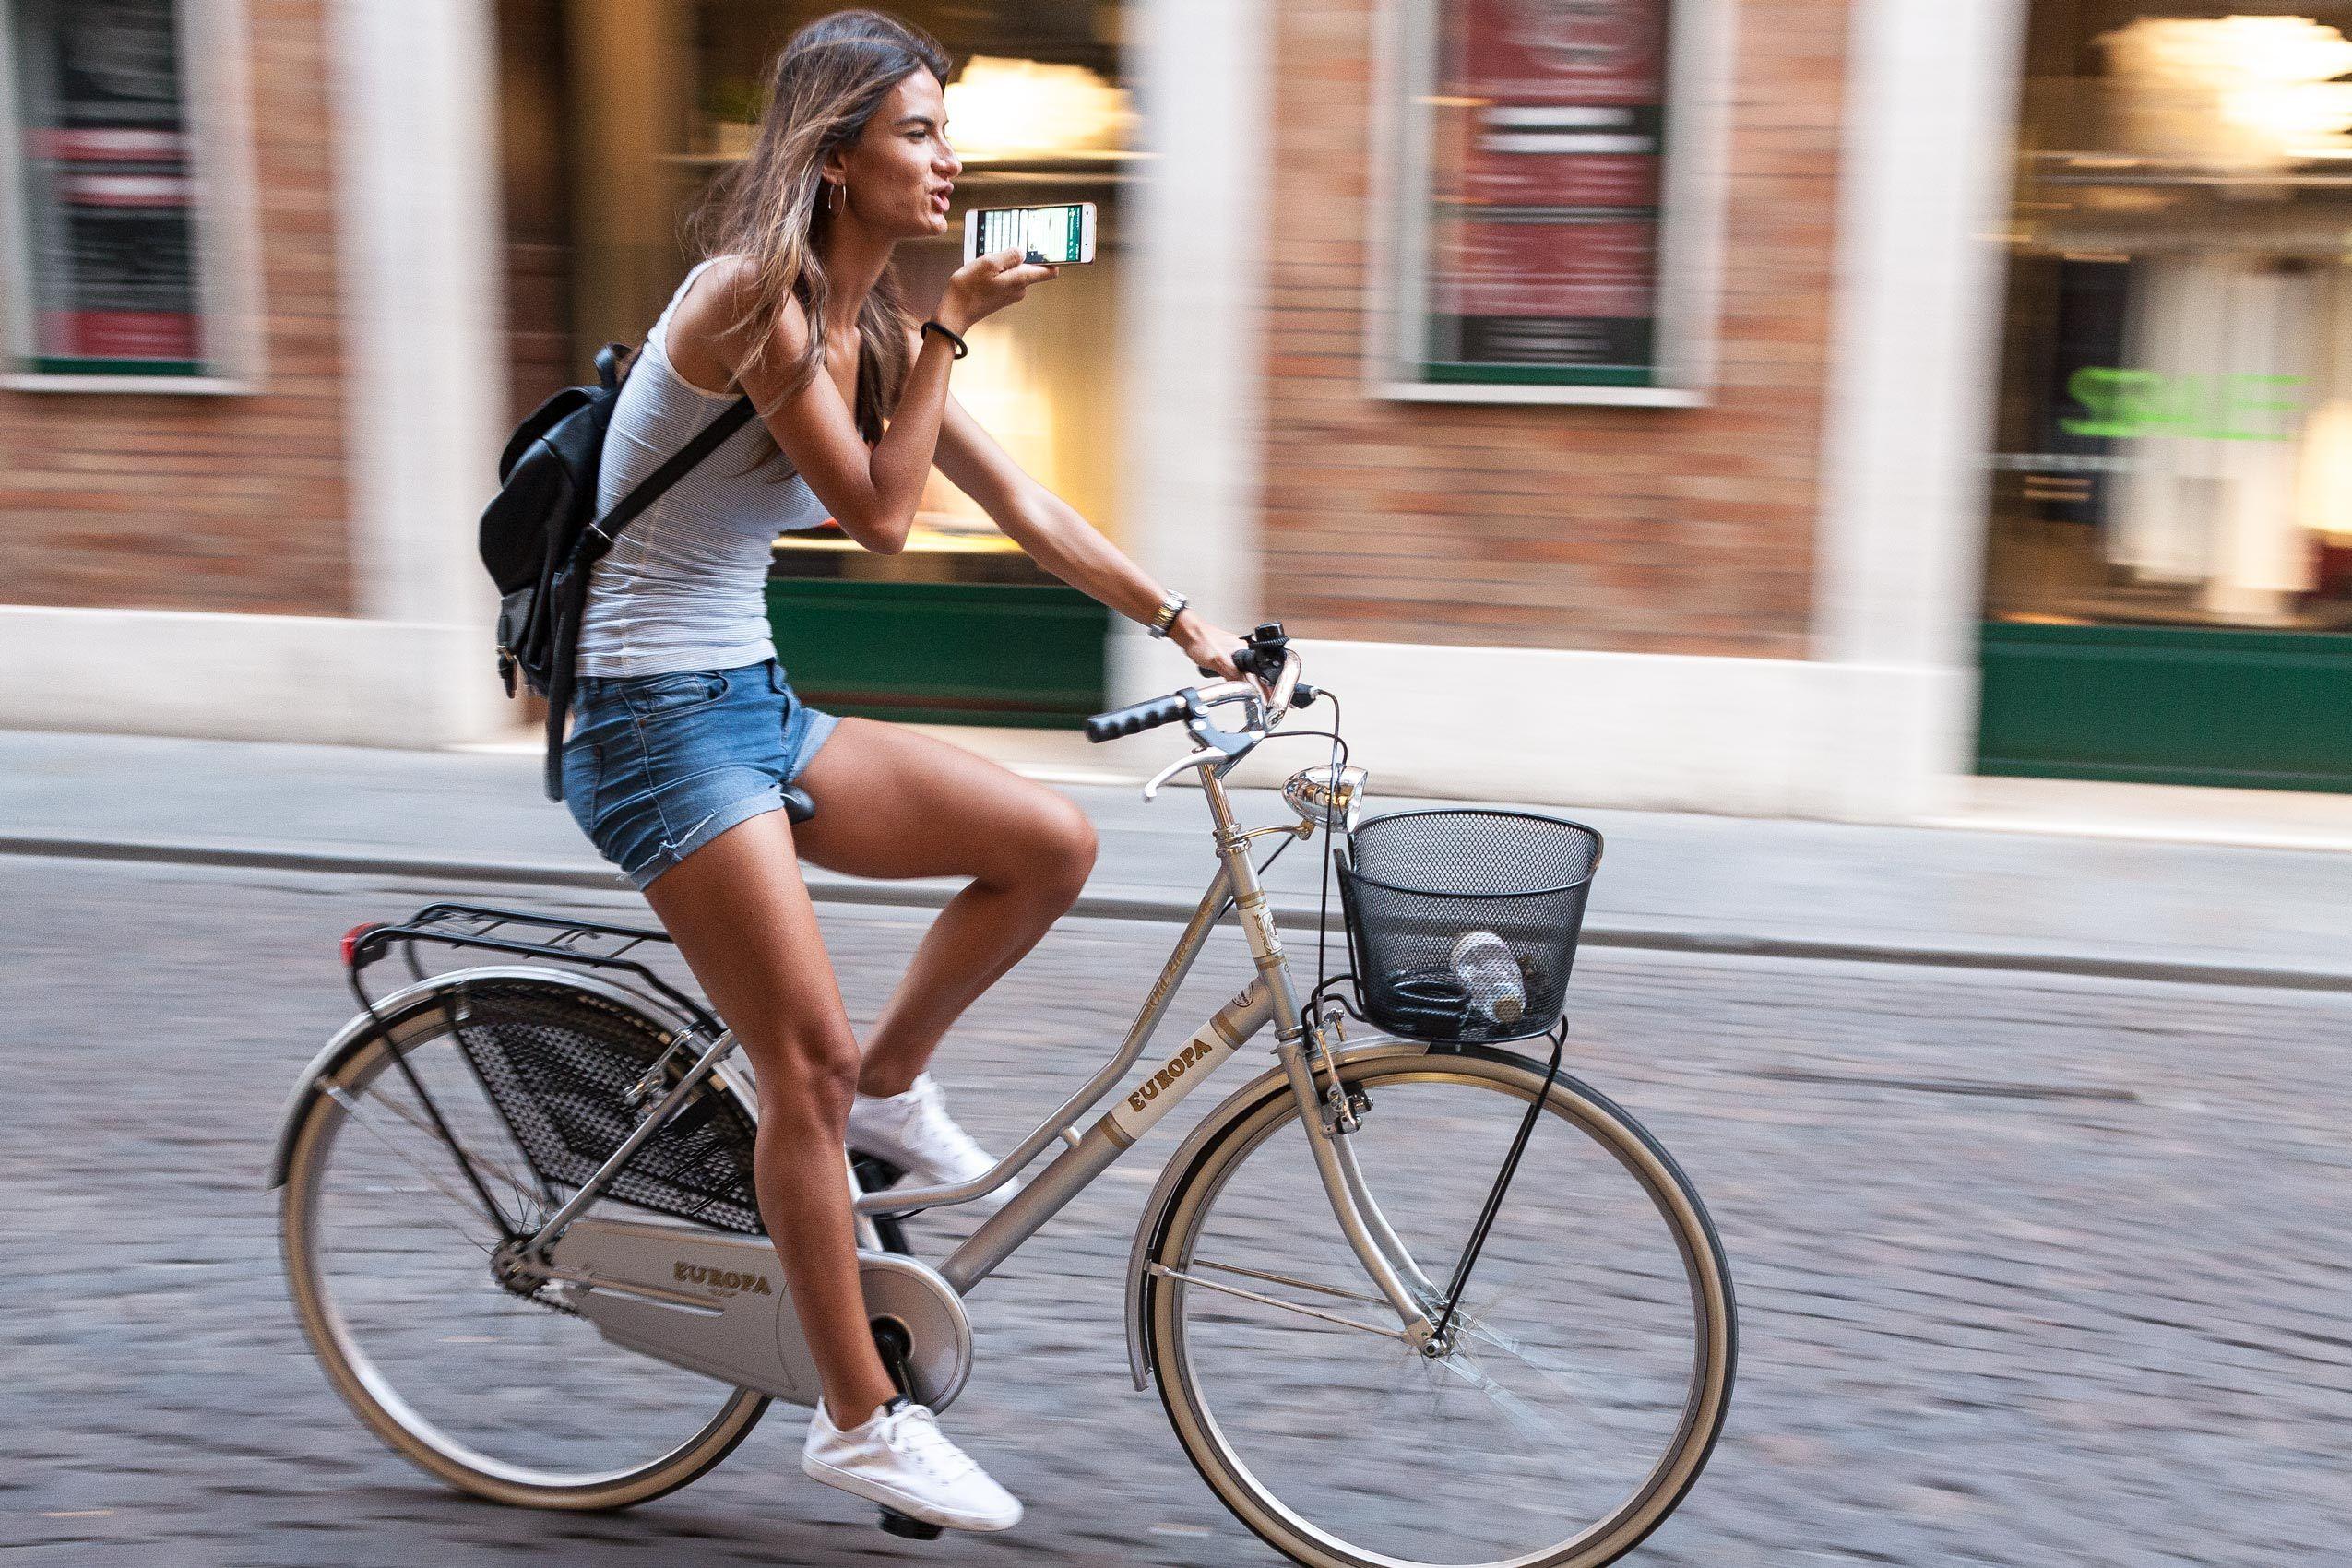 1womanonbike